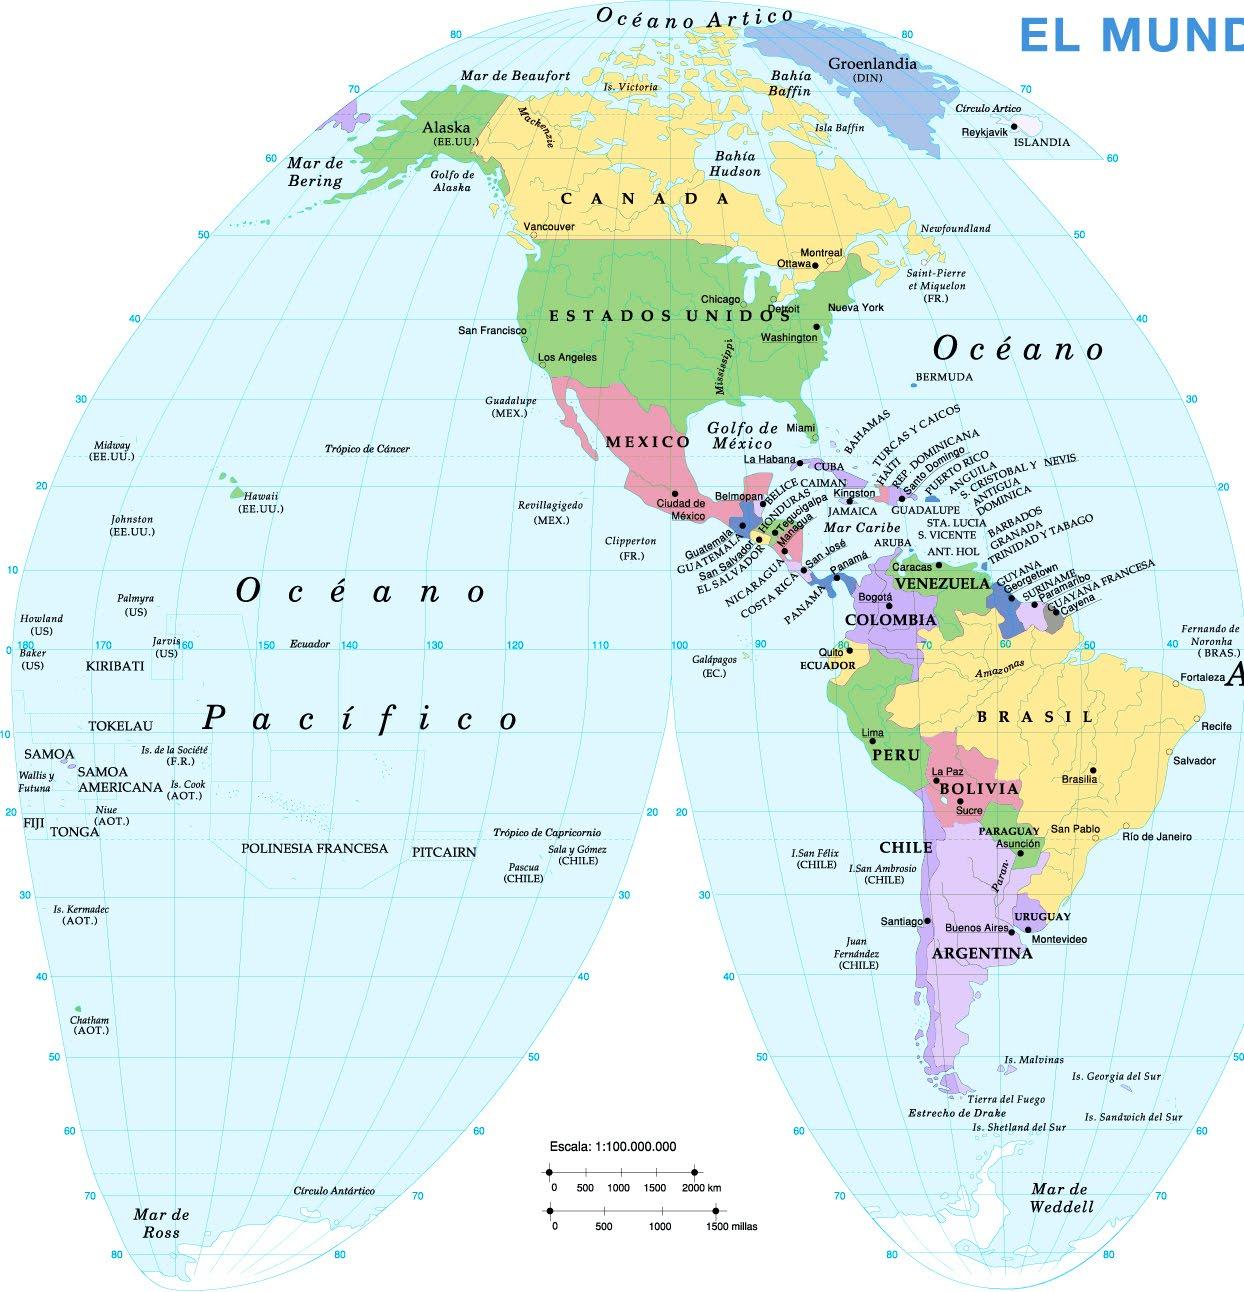 Worksheet. profesor maximino rey mapa Amrica poltico III trimestre